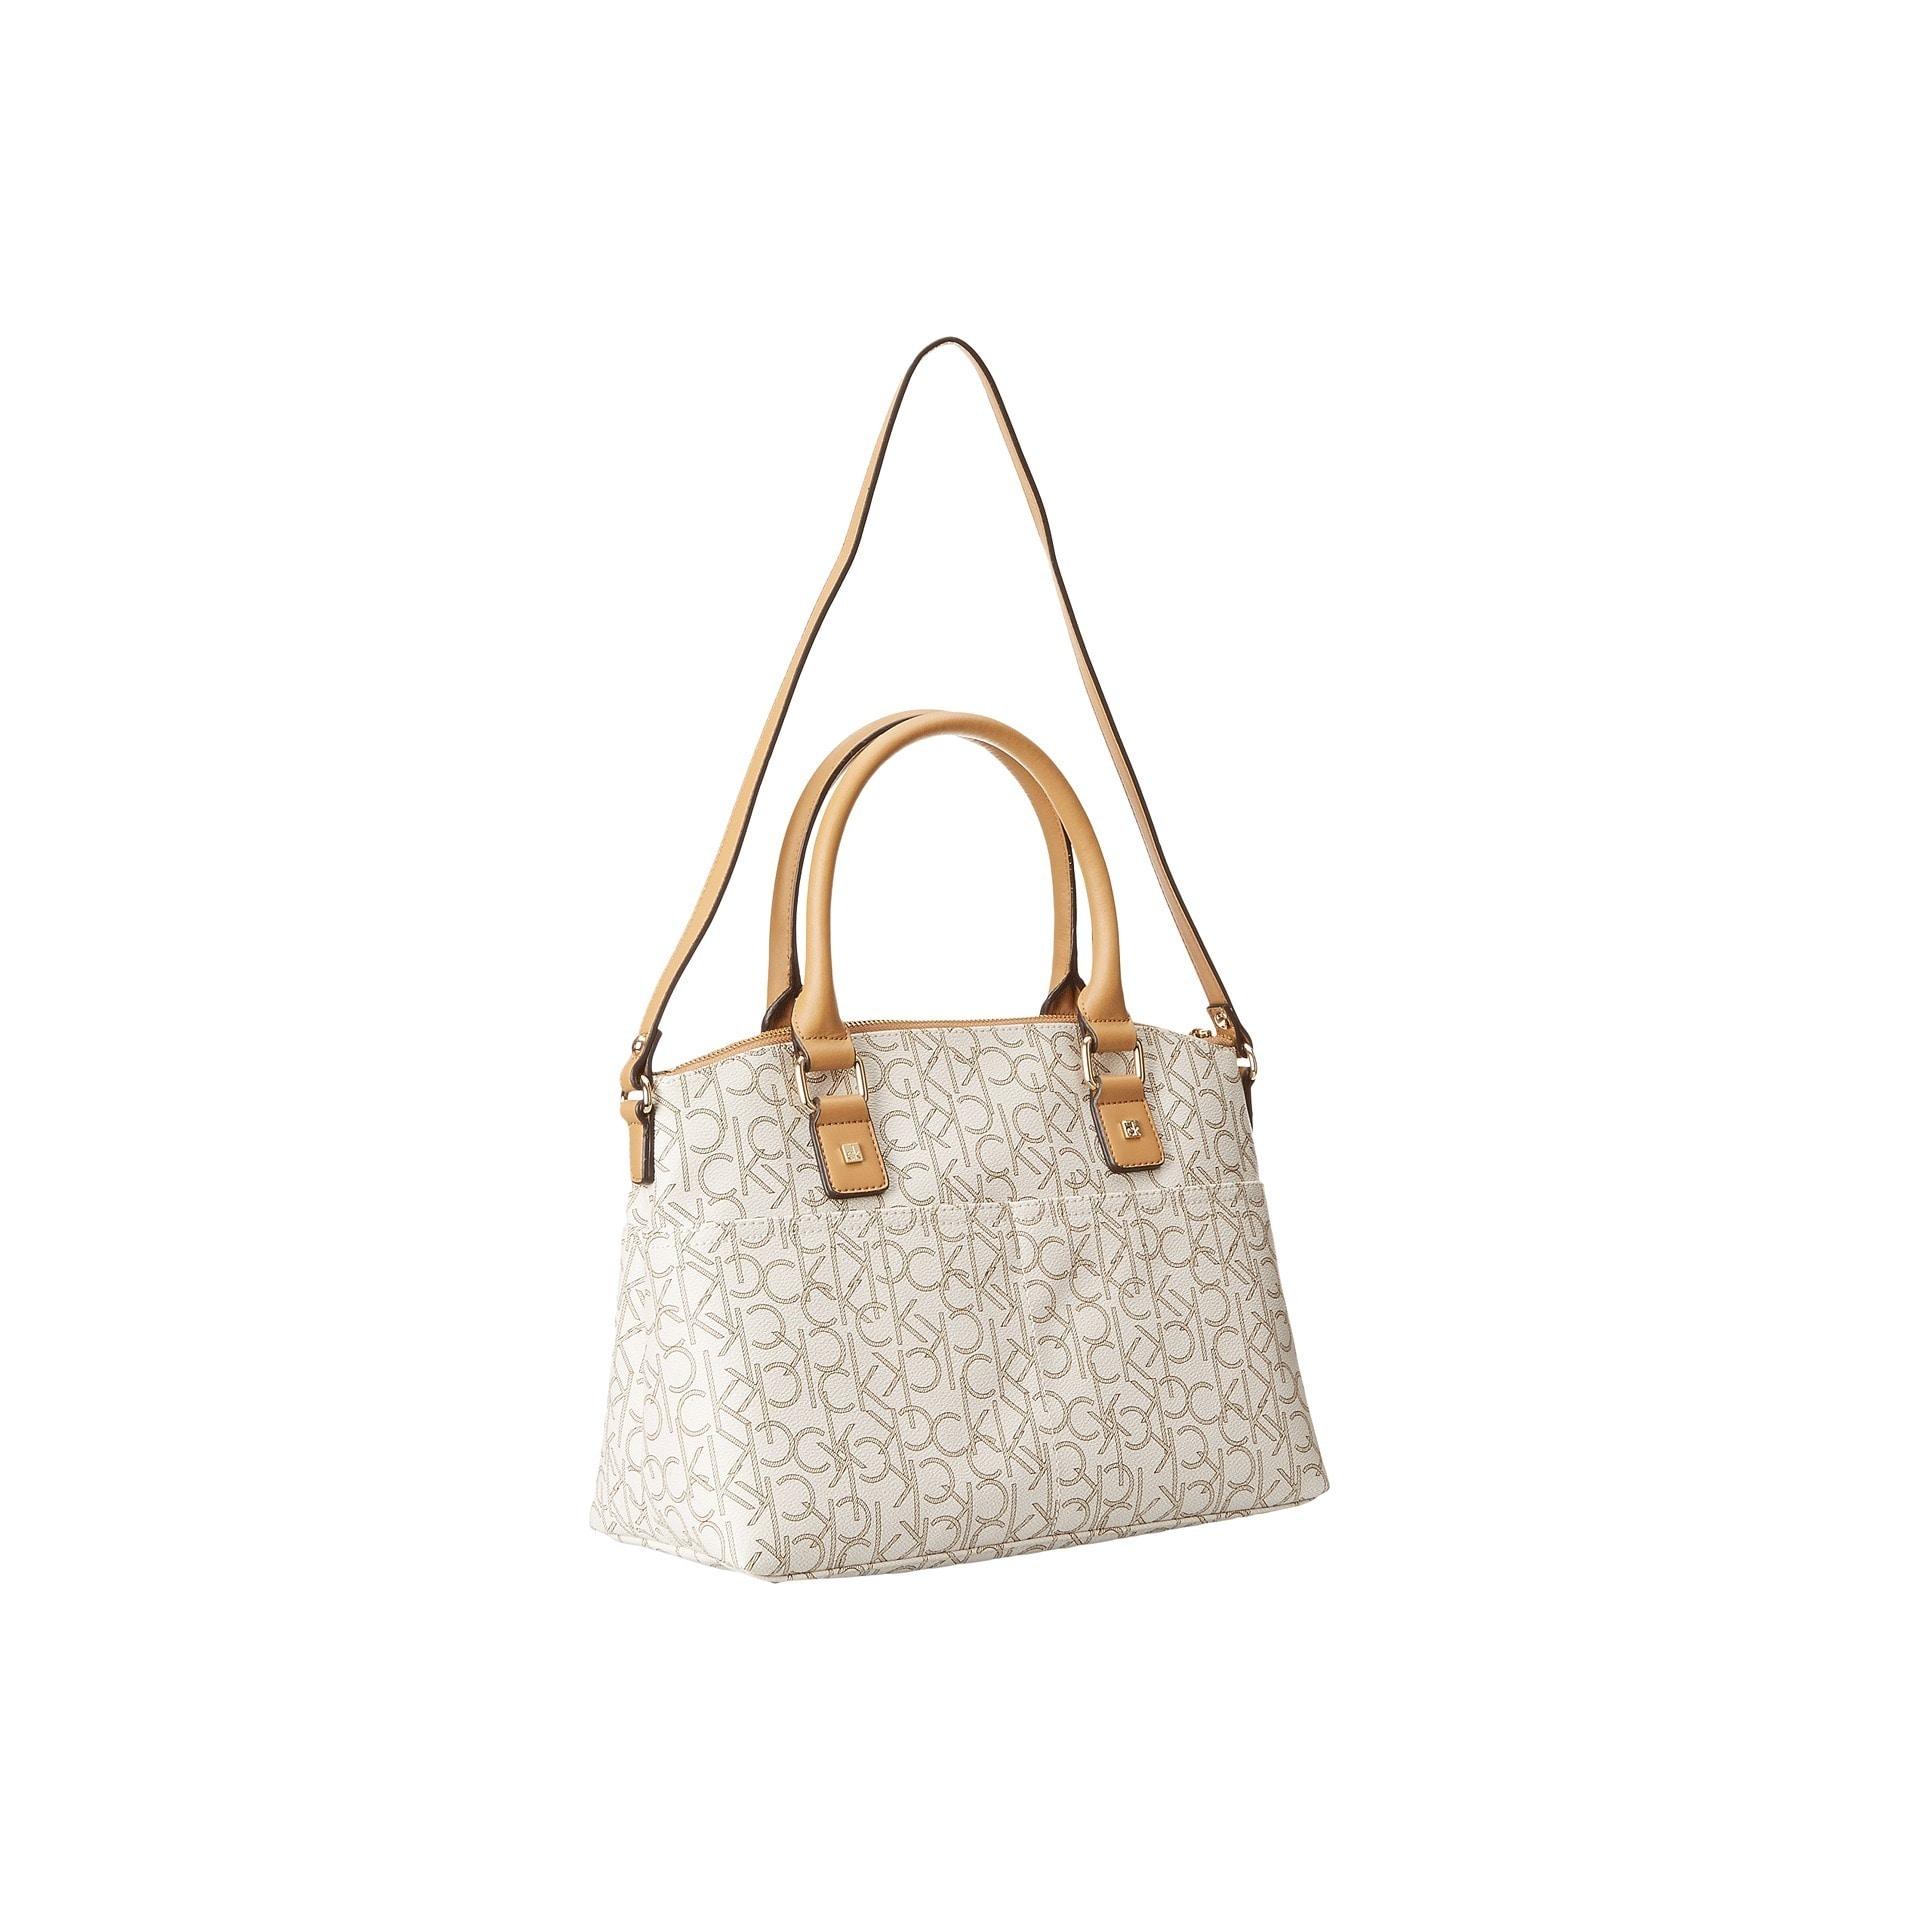 71028f2484 Shop Calvin Klein Hudson CK Monogram Almond/Khaki/Camel Faux Leather  Satchel Handbag - Free Shipping Today - Overstock - 13261378